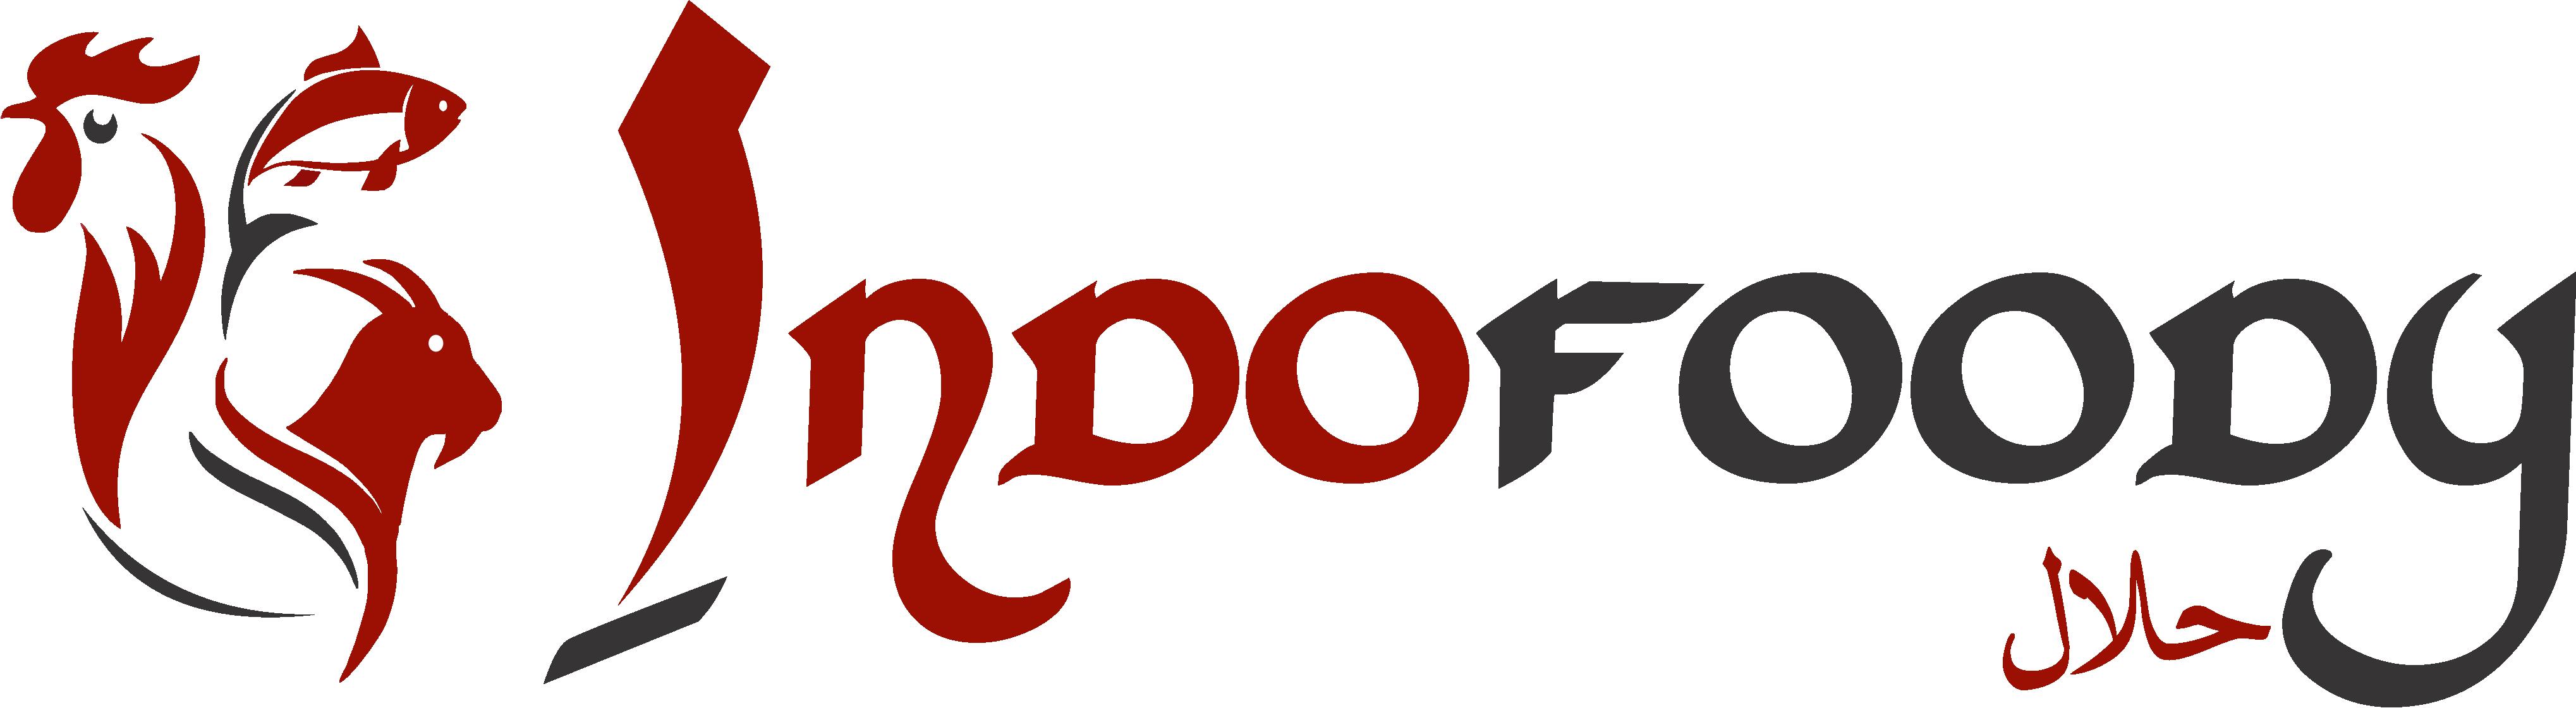 Indofoody